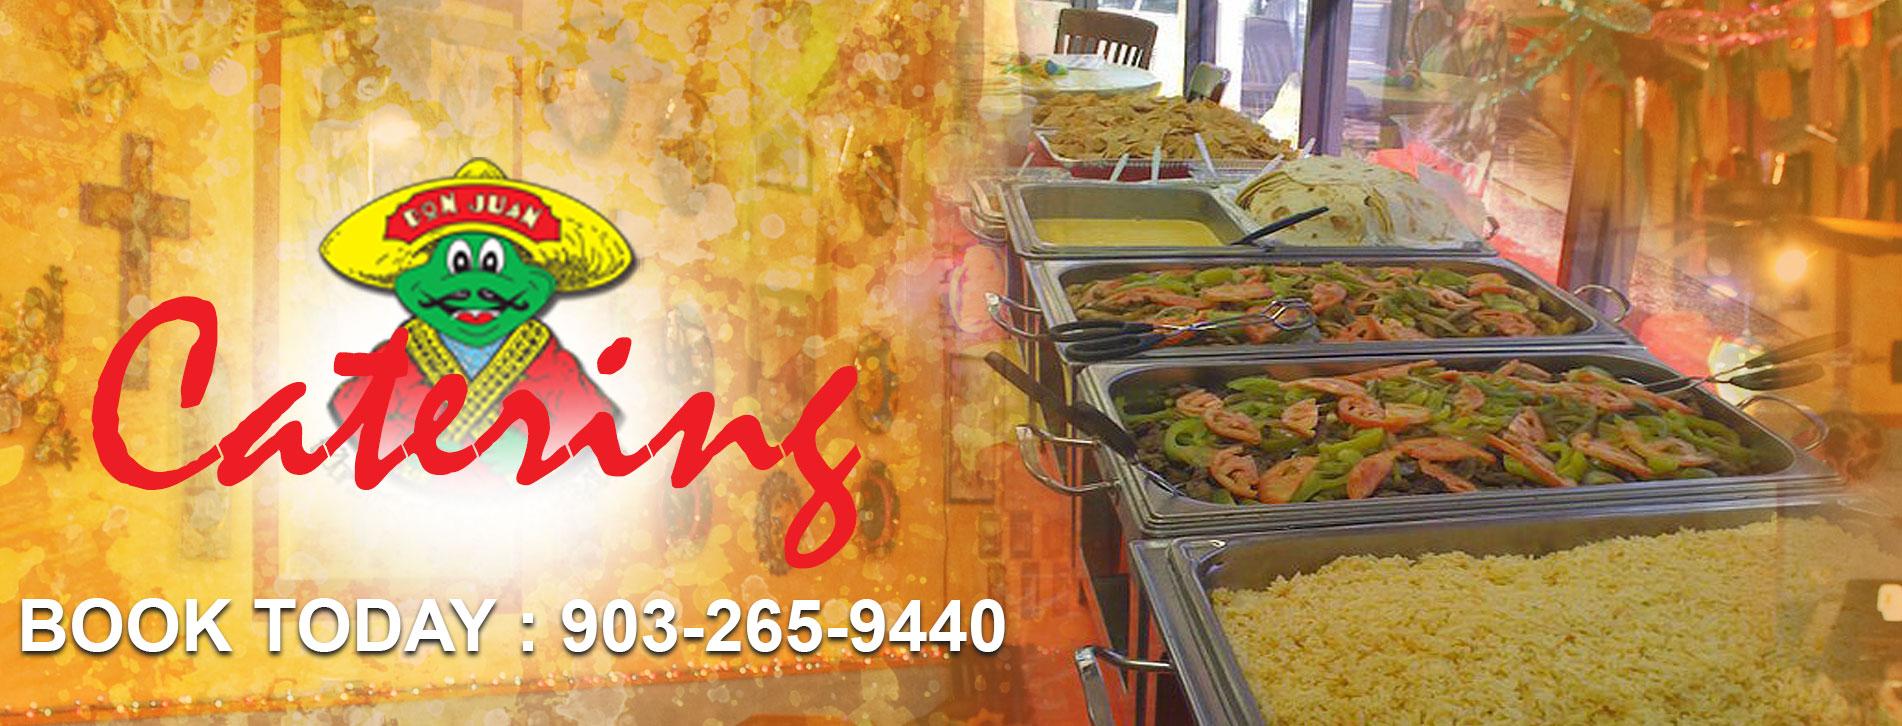 wedding catering tyler east texas